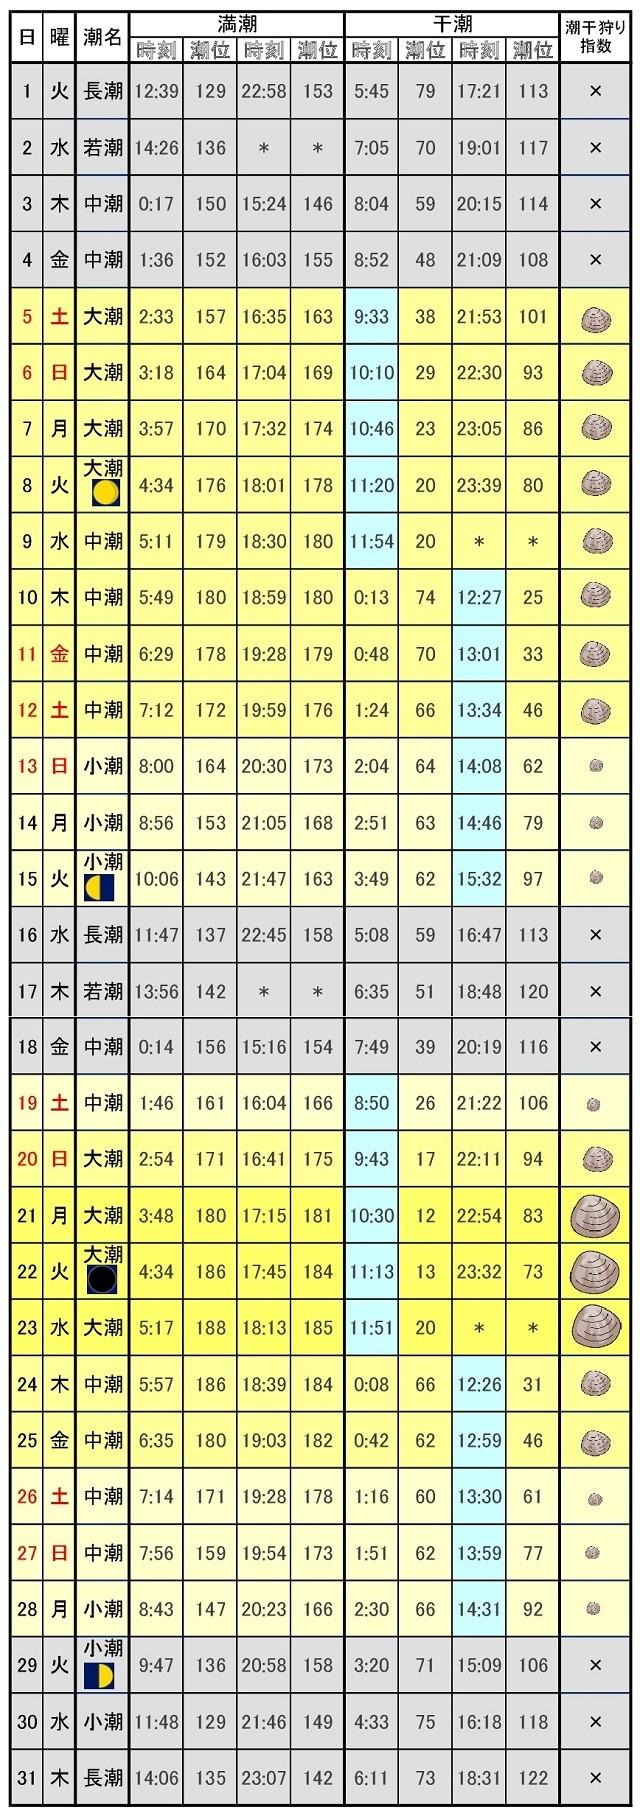 木更津潮干狩り潮位表2017年8月